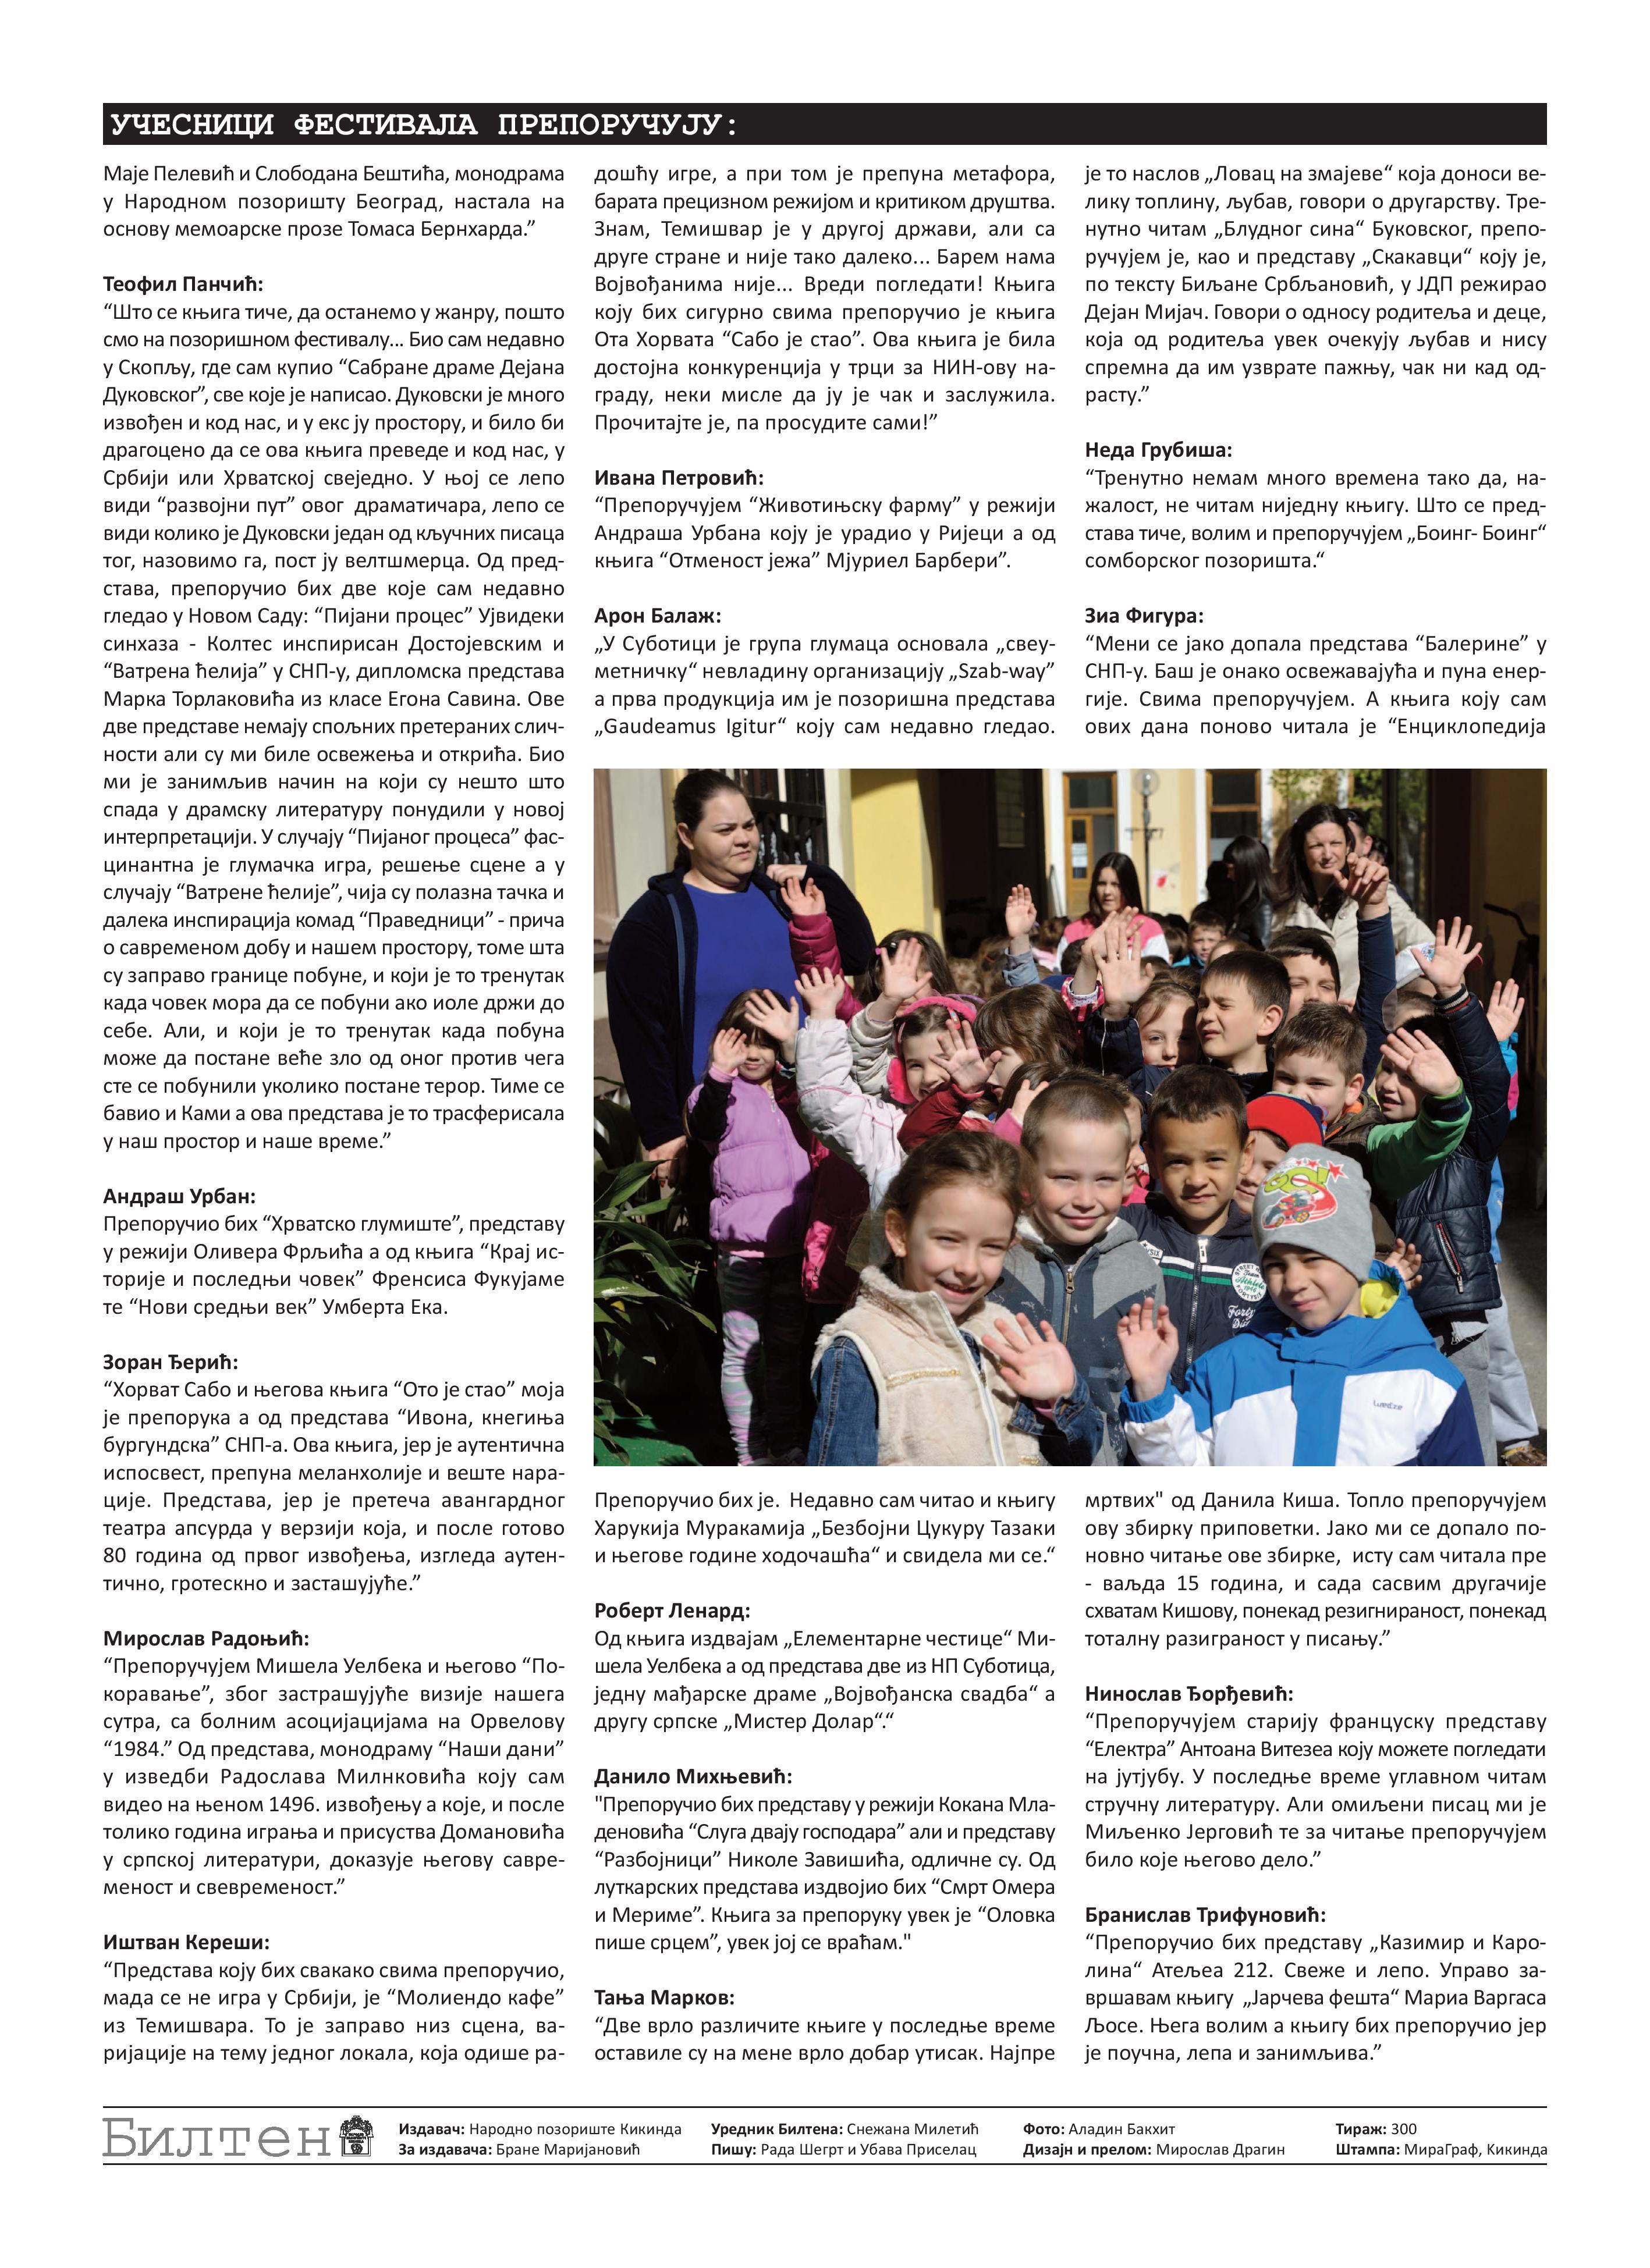 BILTEN_07_26 april_2015-01-page-008